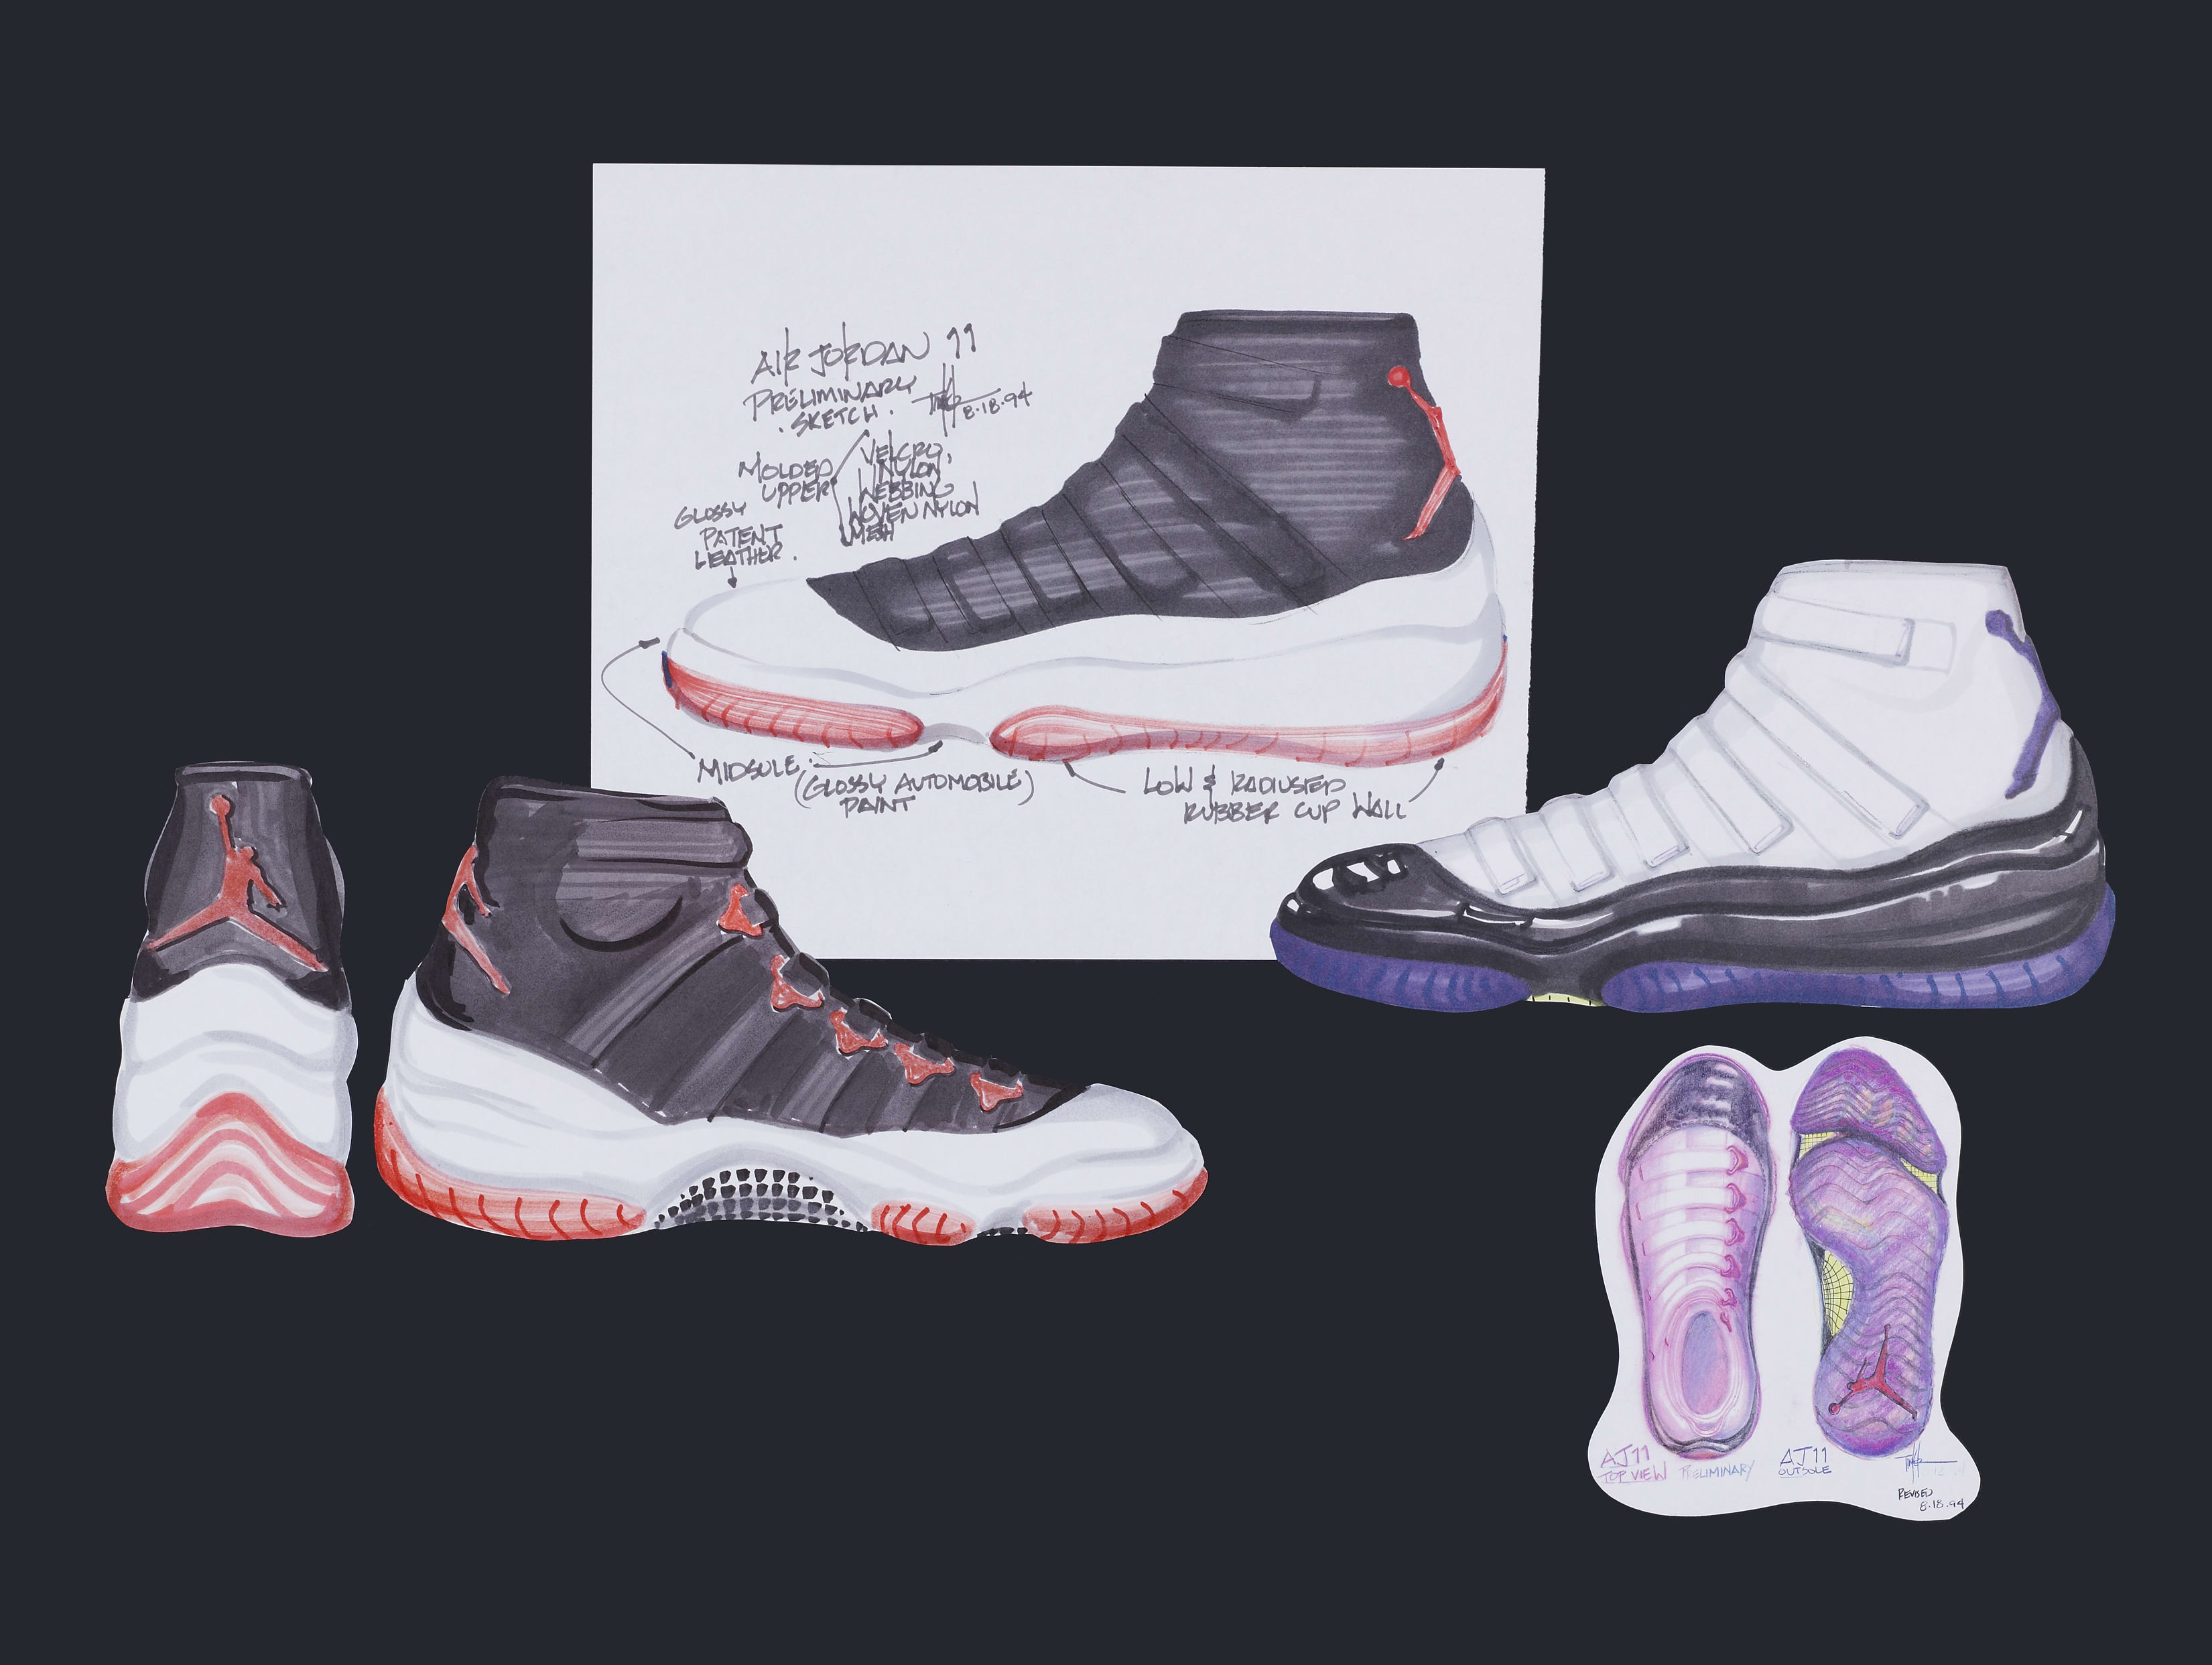 Air Jordan 11 Tinker Hatfield Sketch